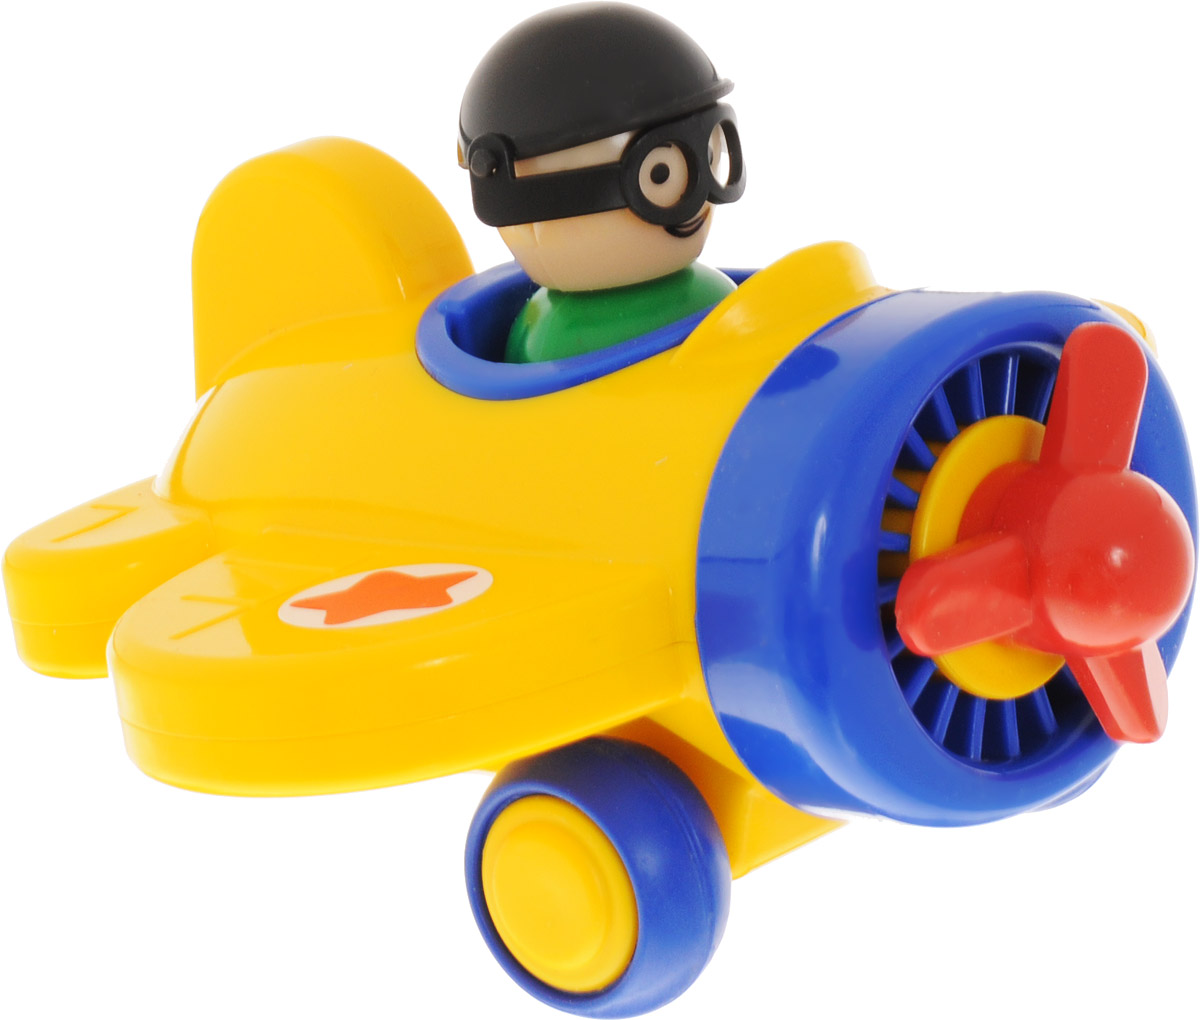 Форма Самолетик Детский сад цвет желтый